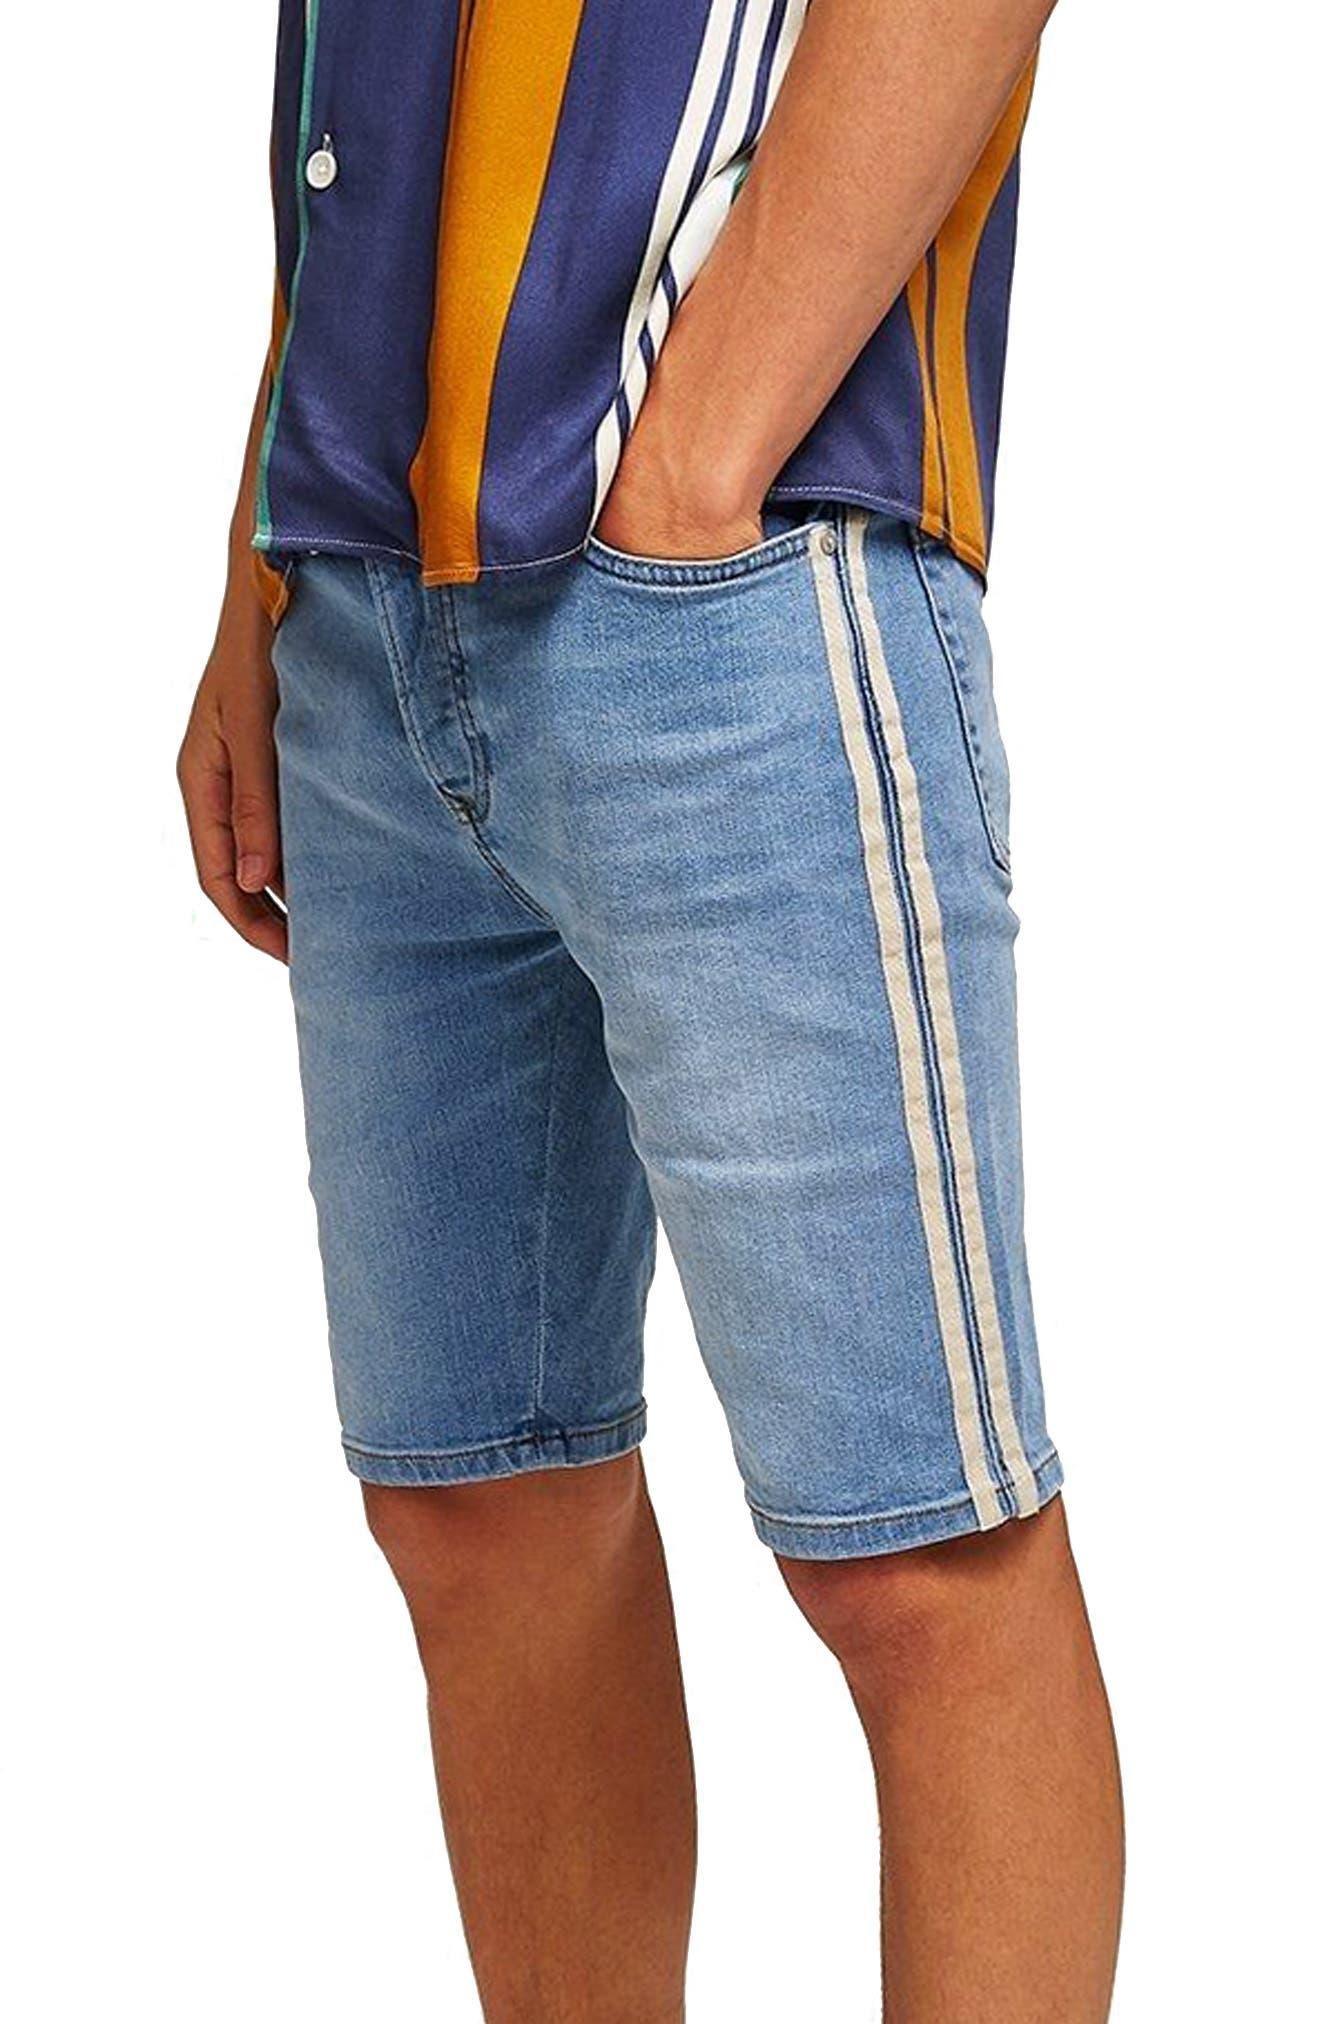 Tape Stretch Skinny Fit Denim Shorts,                         Main,                         color, 400